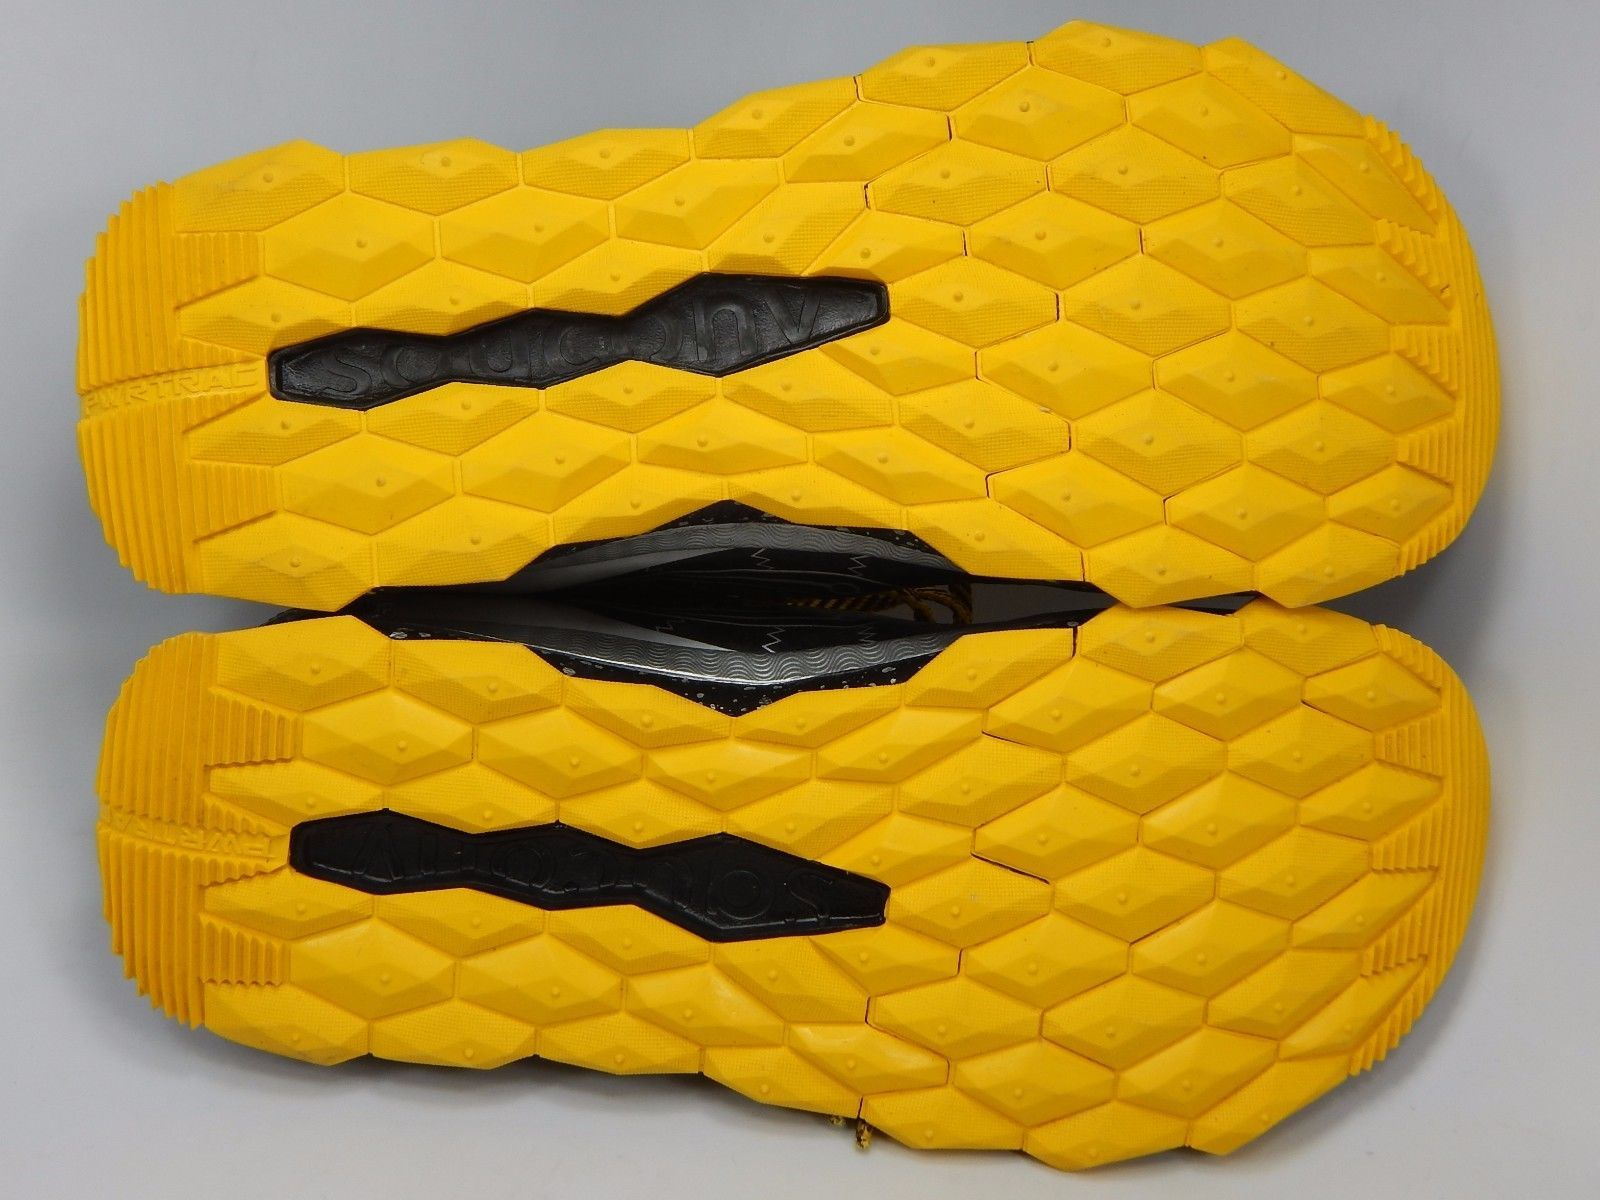 Saucony Nomad TR Men's Trail Running Shoes Size US 9 M (D) EU 42.5 Gray S20287-3